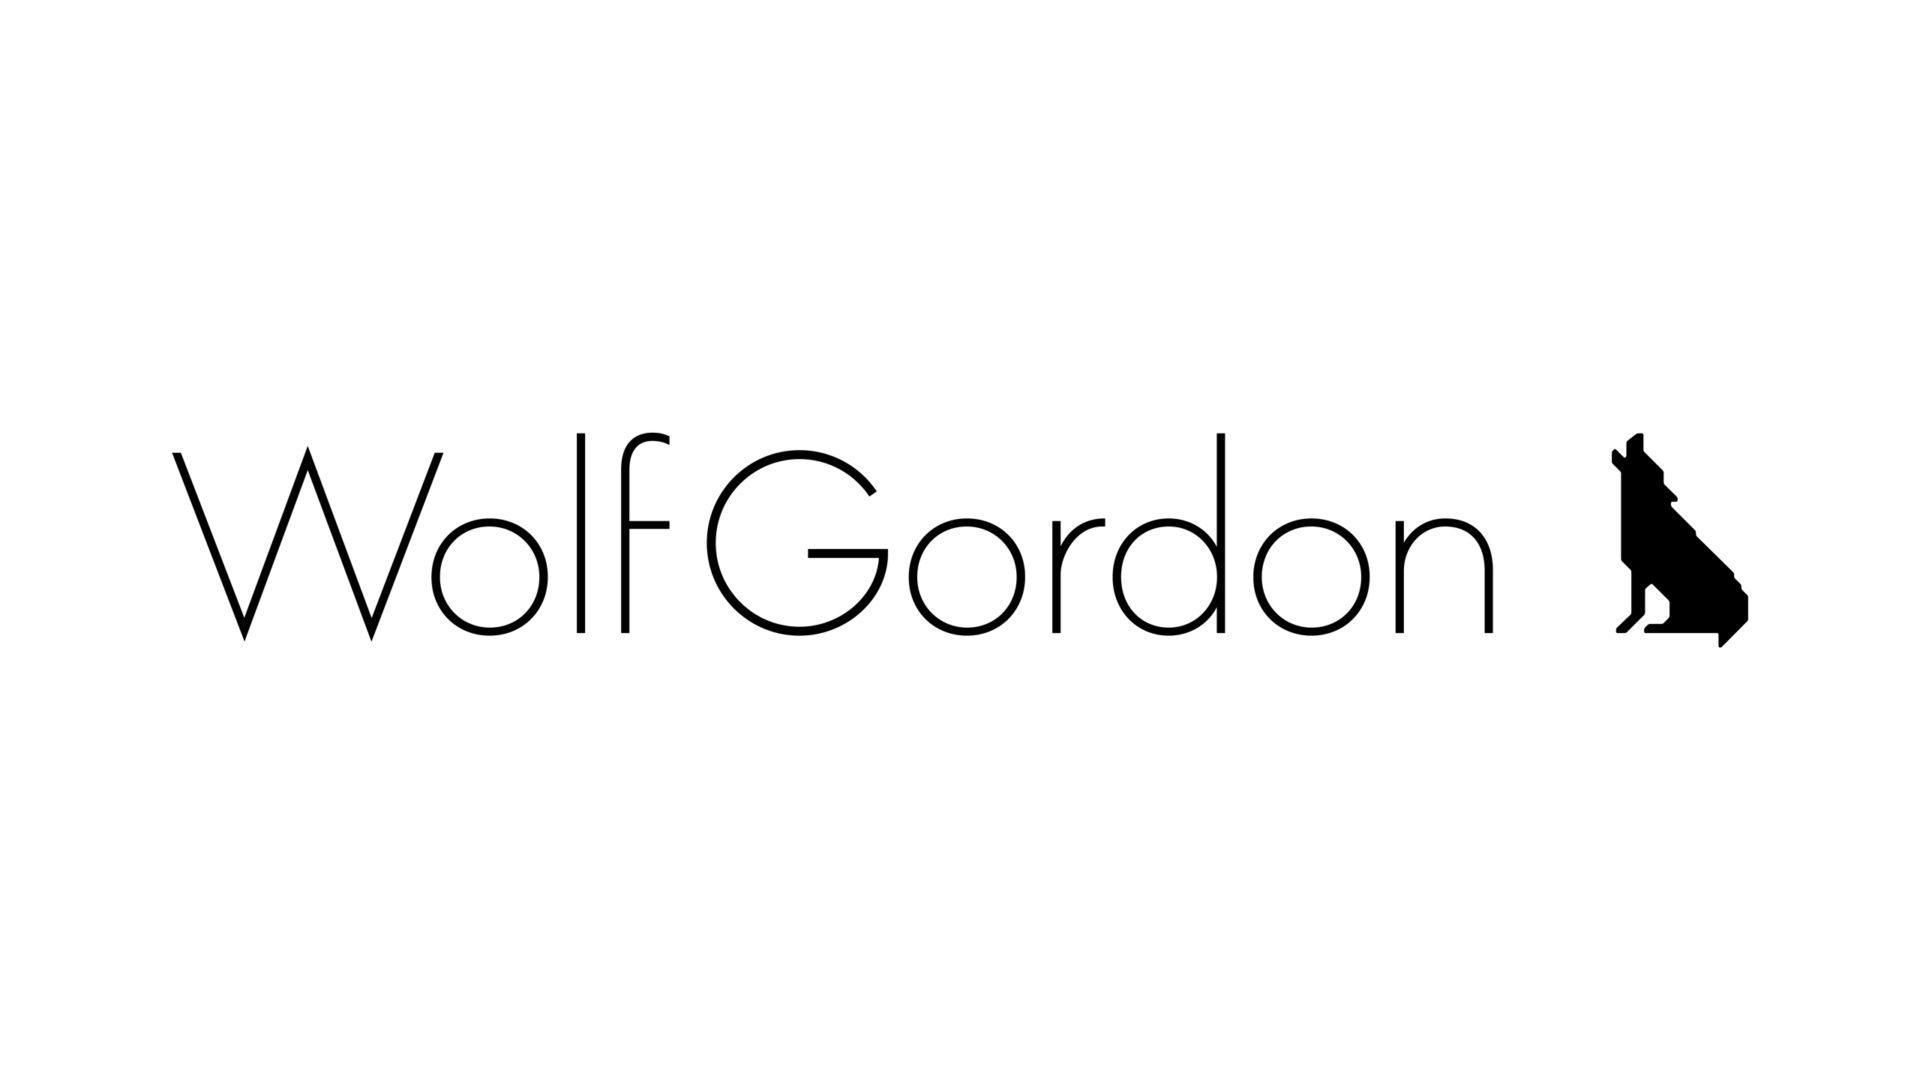 wolf-gordon identity